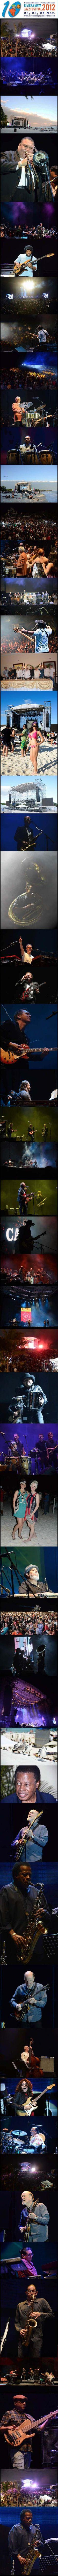 Riviera Maya Jazz Festival 2012